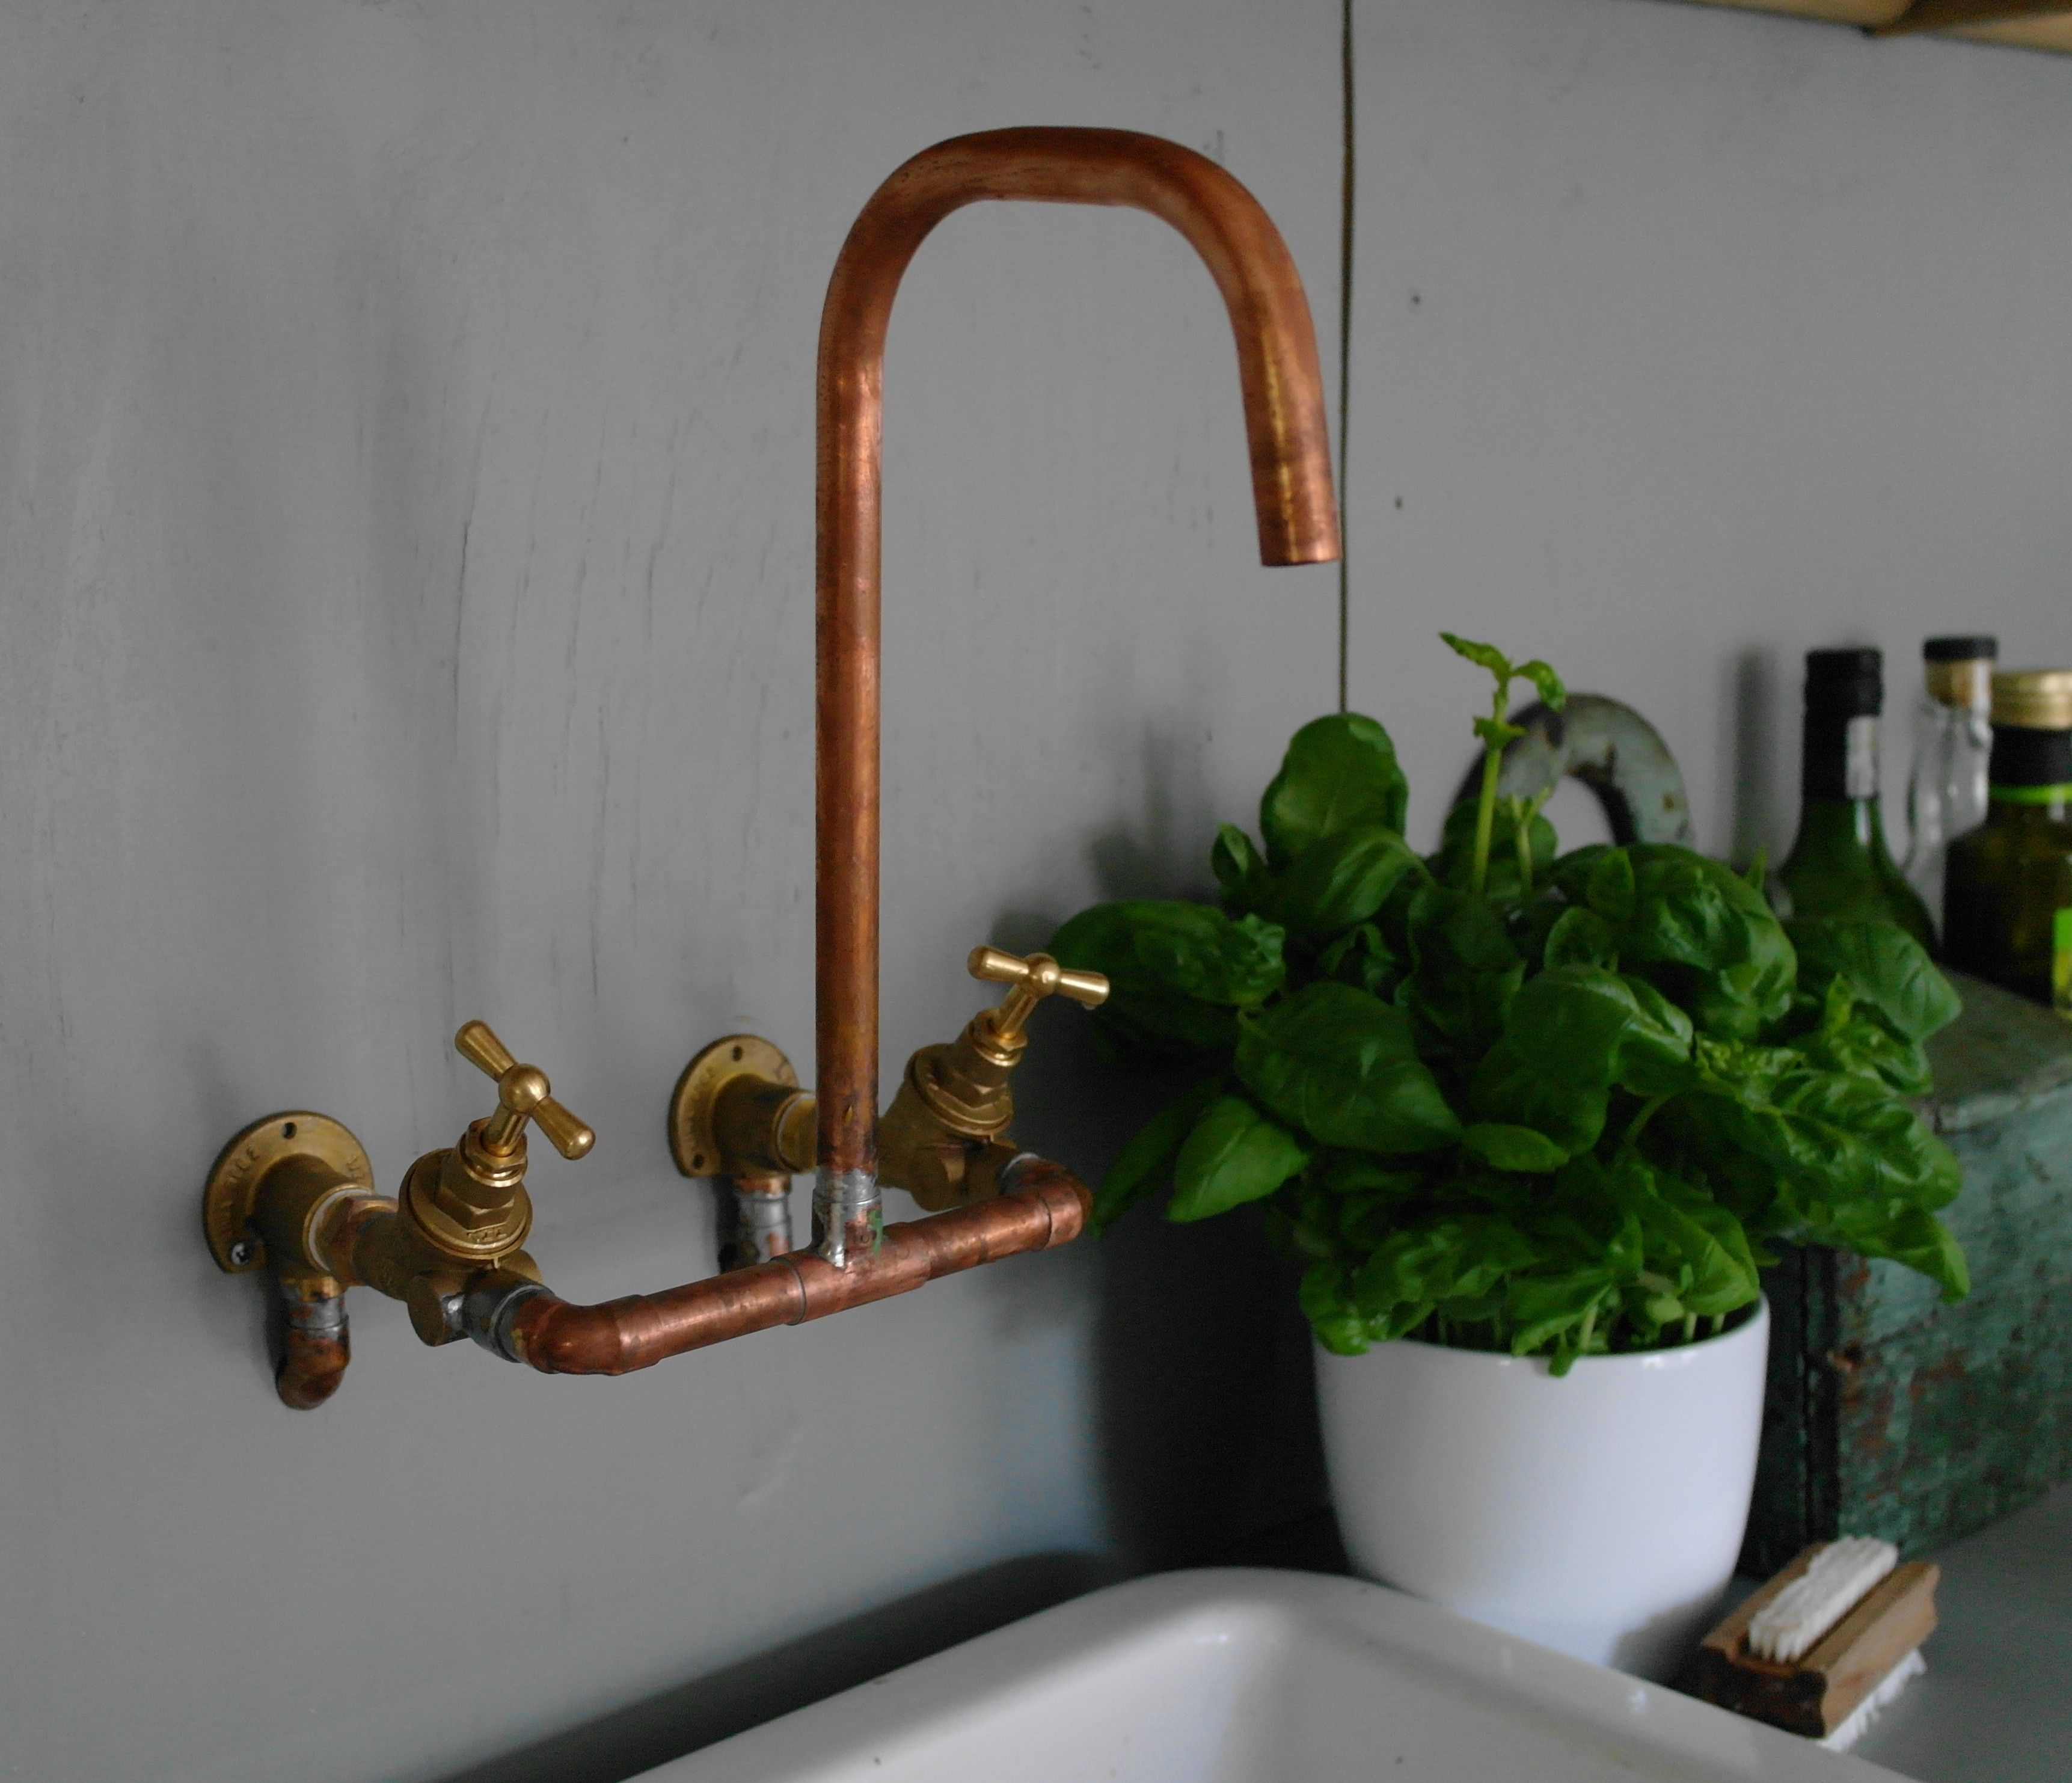 Copper faucet | Home Décor | Pinterest | Sinks, Mixer taps and Metals